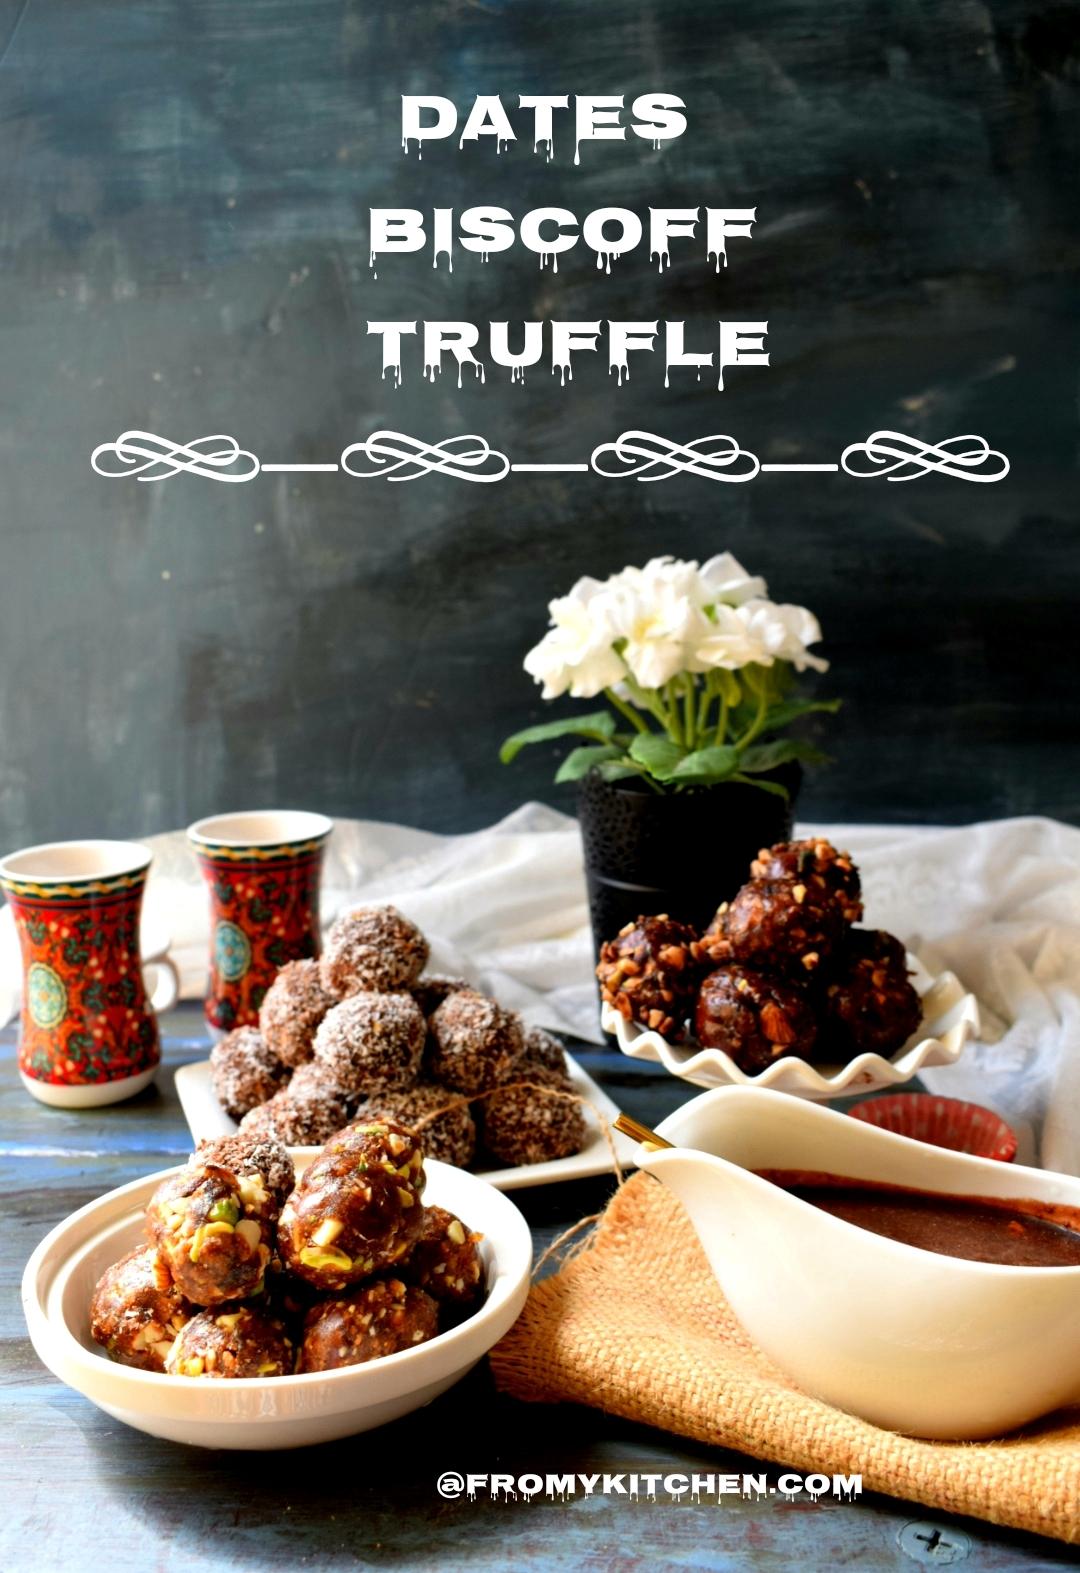 Dates Biscoff Truffle